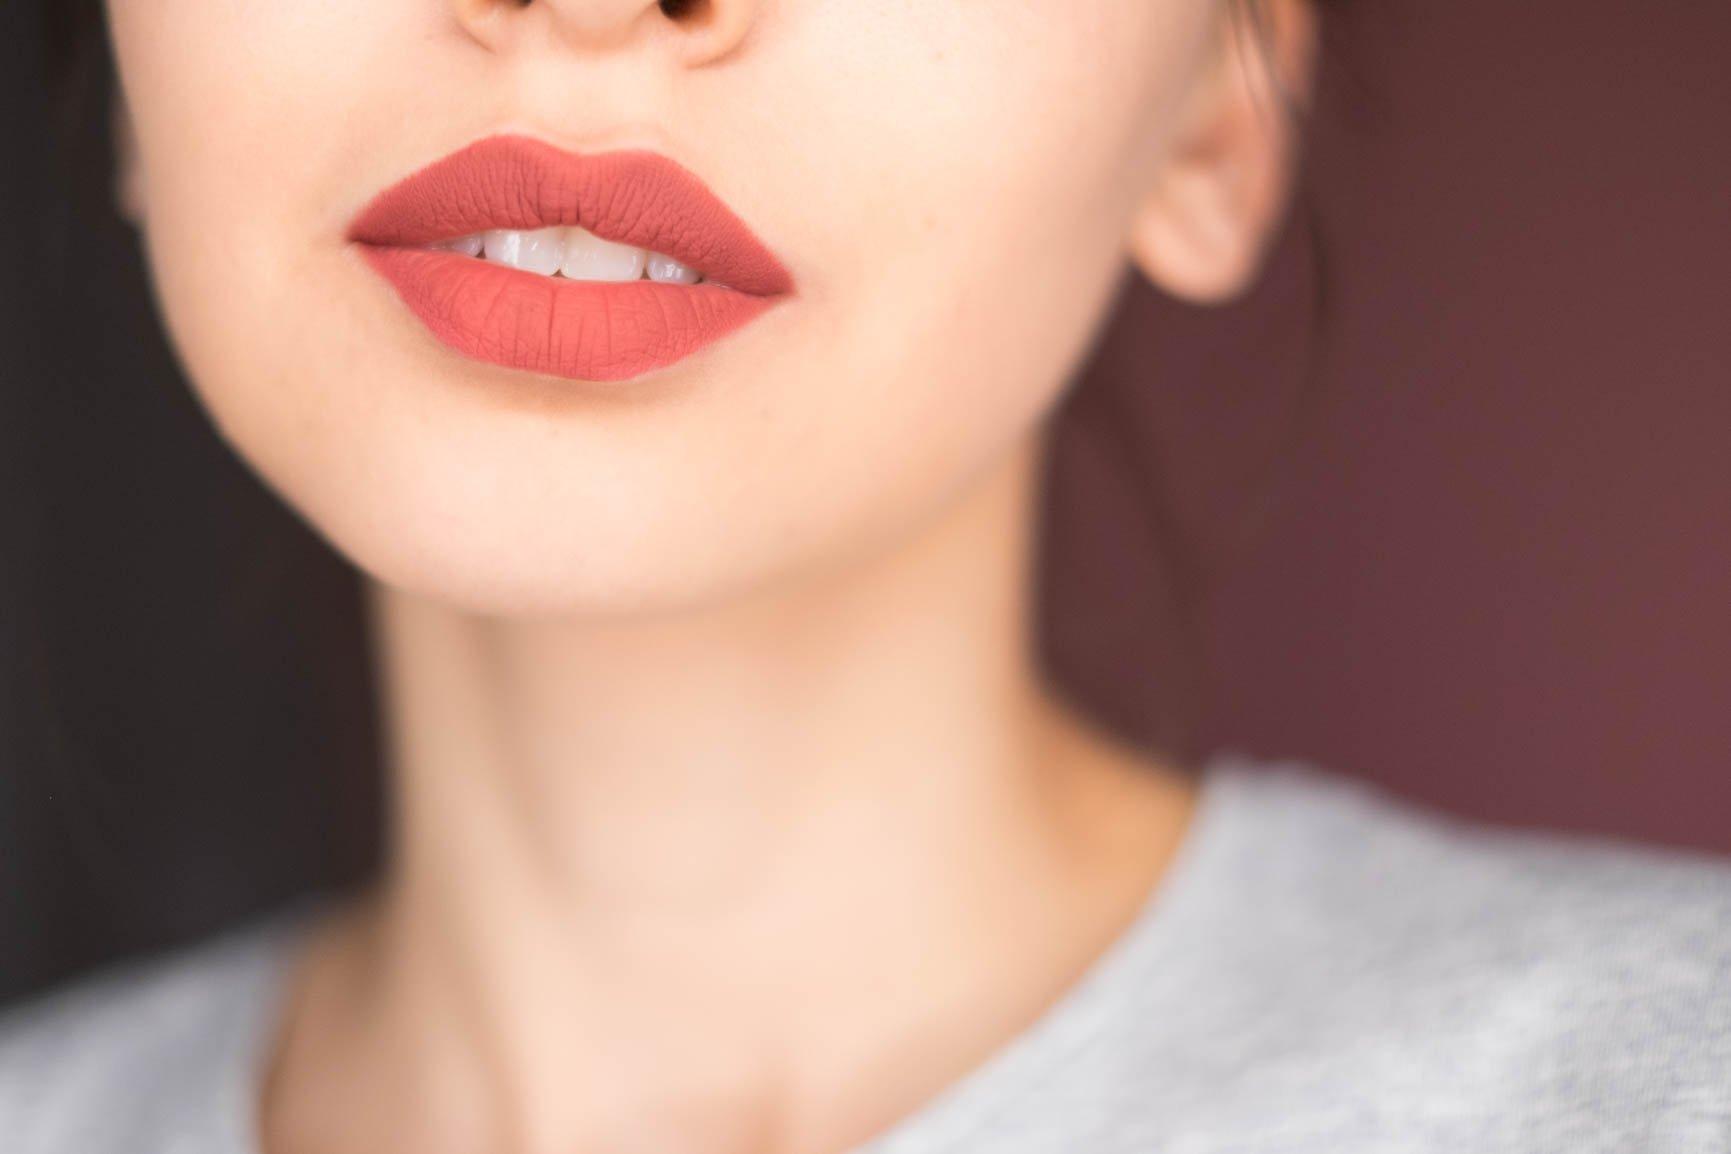 sunkissedblush-anastasia-beverly-hills-liquid-lipstick-nars-powermatte-lip-pigment-11